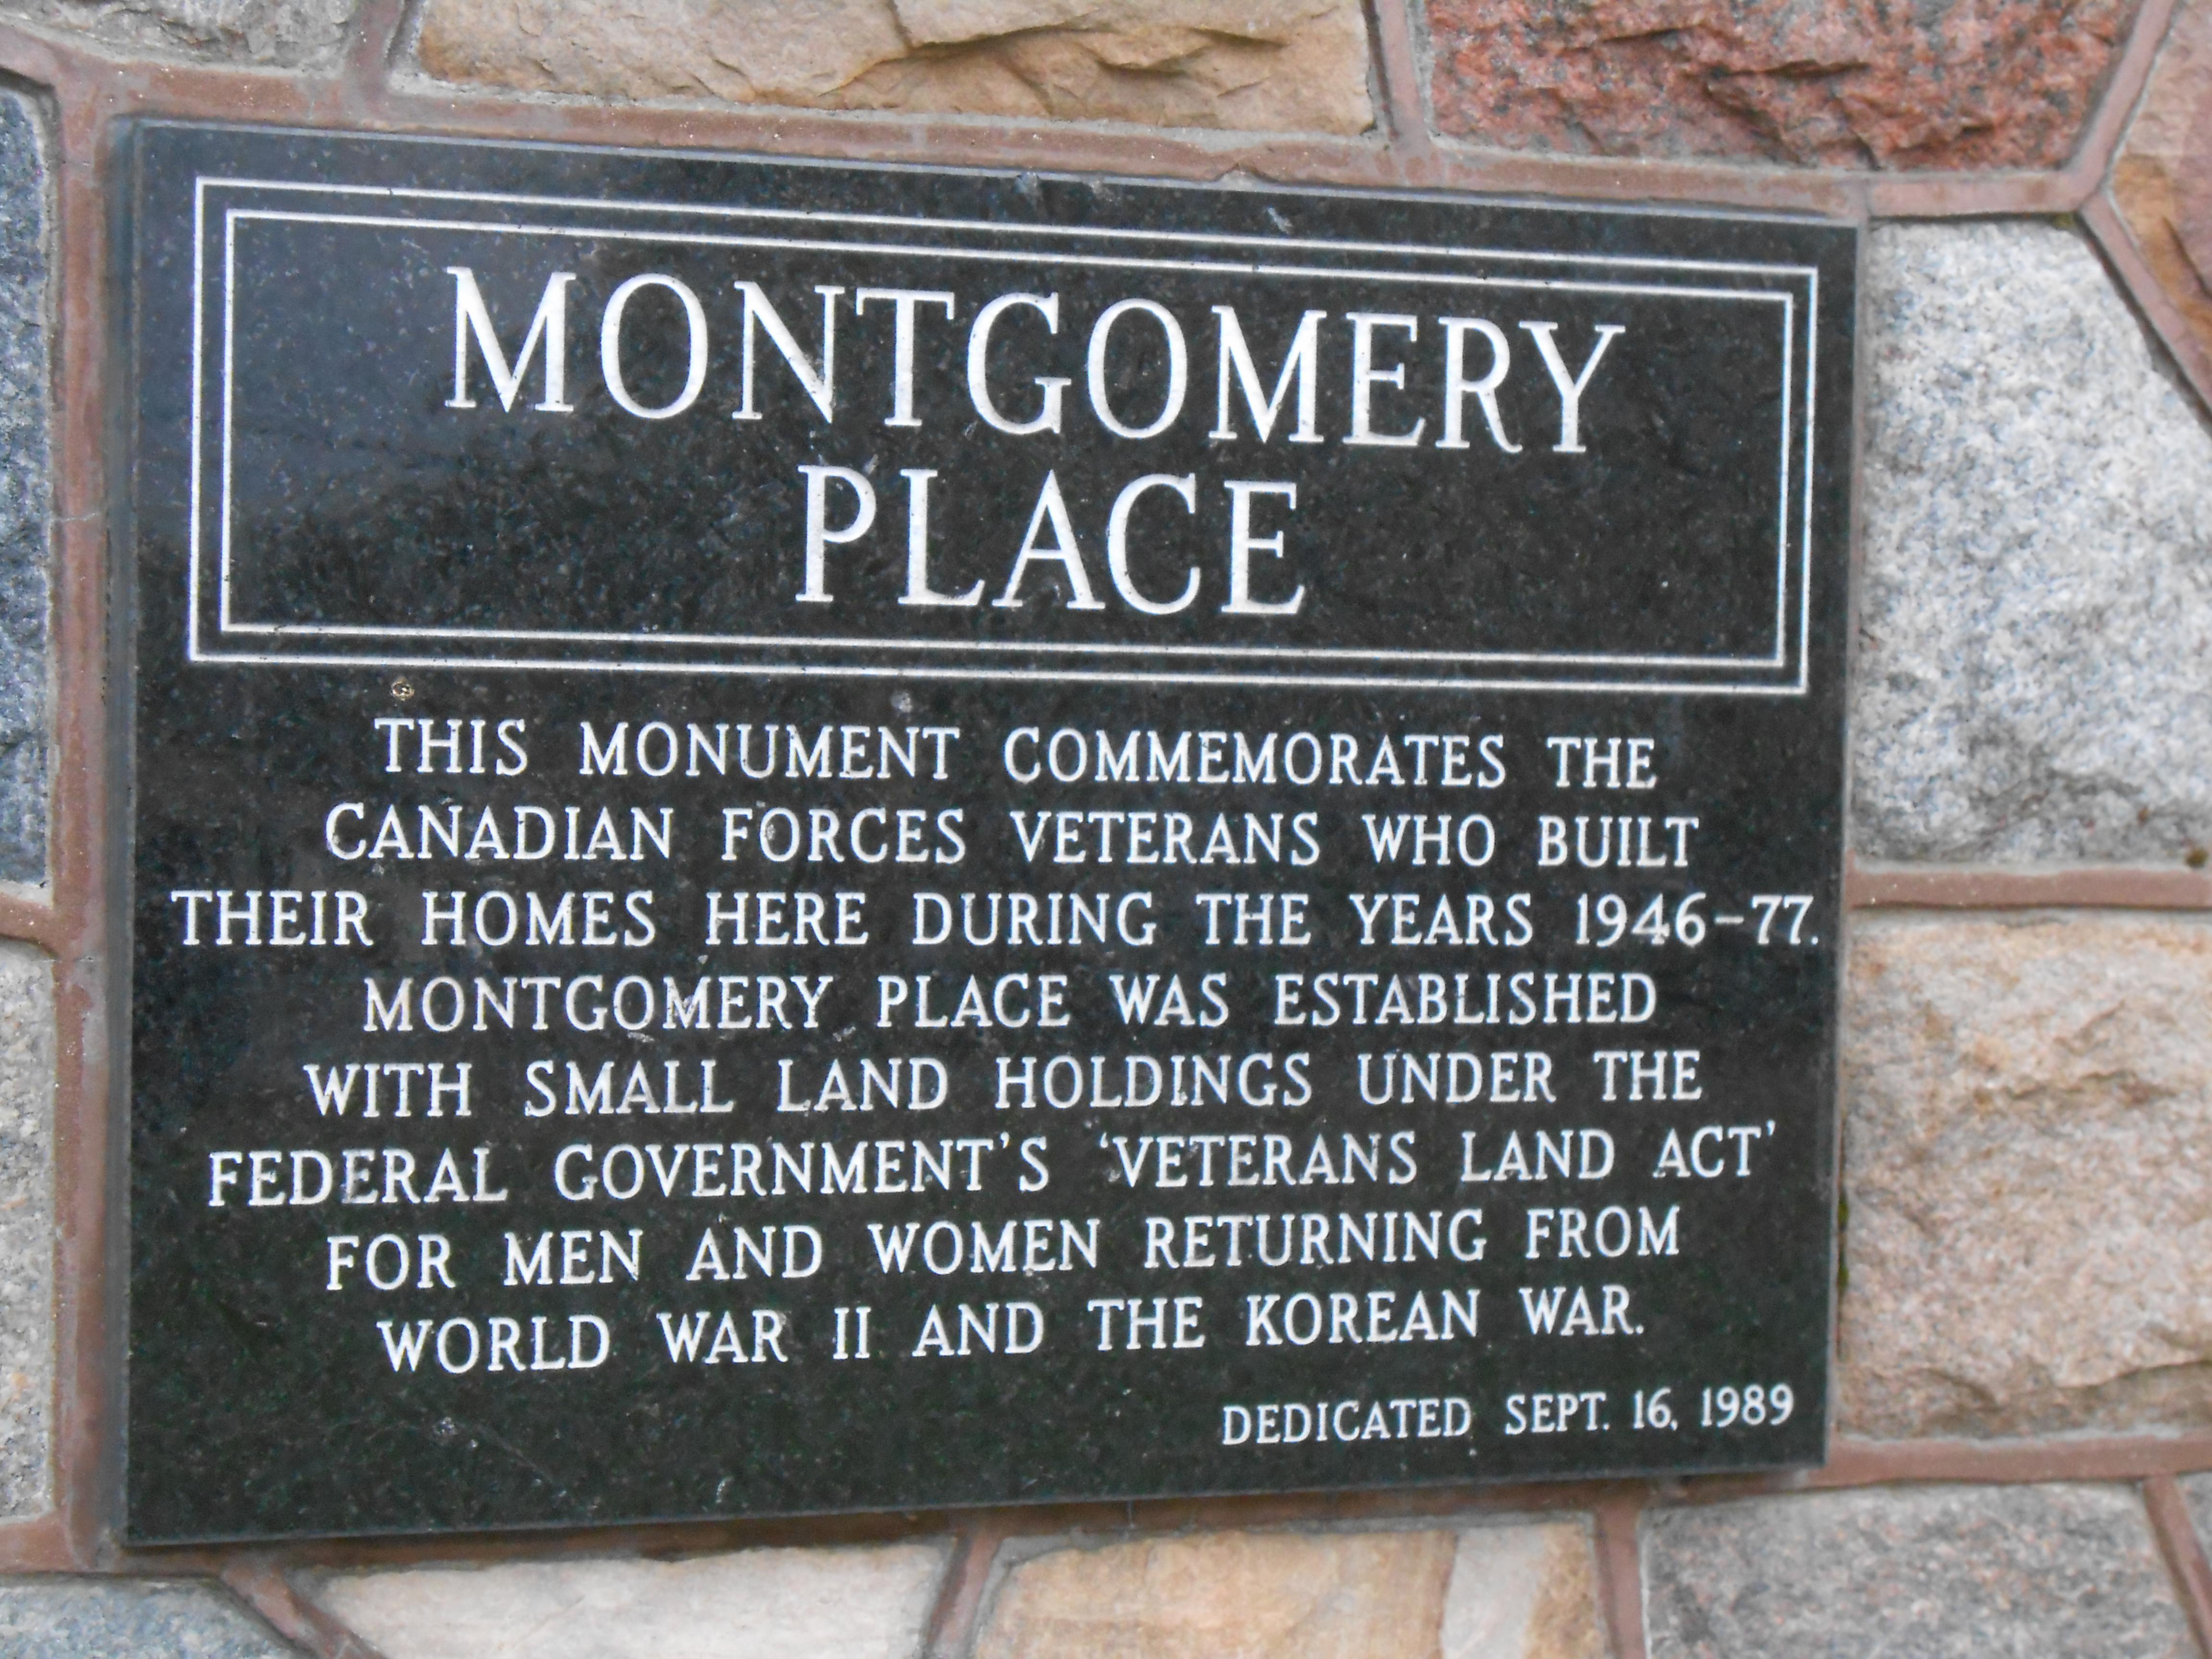 Montgomery Place Monument, Saskatoon, Saskatchewan